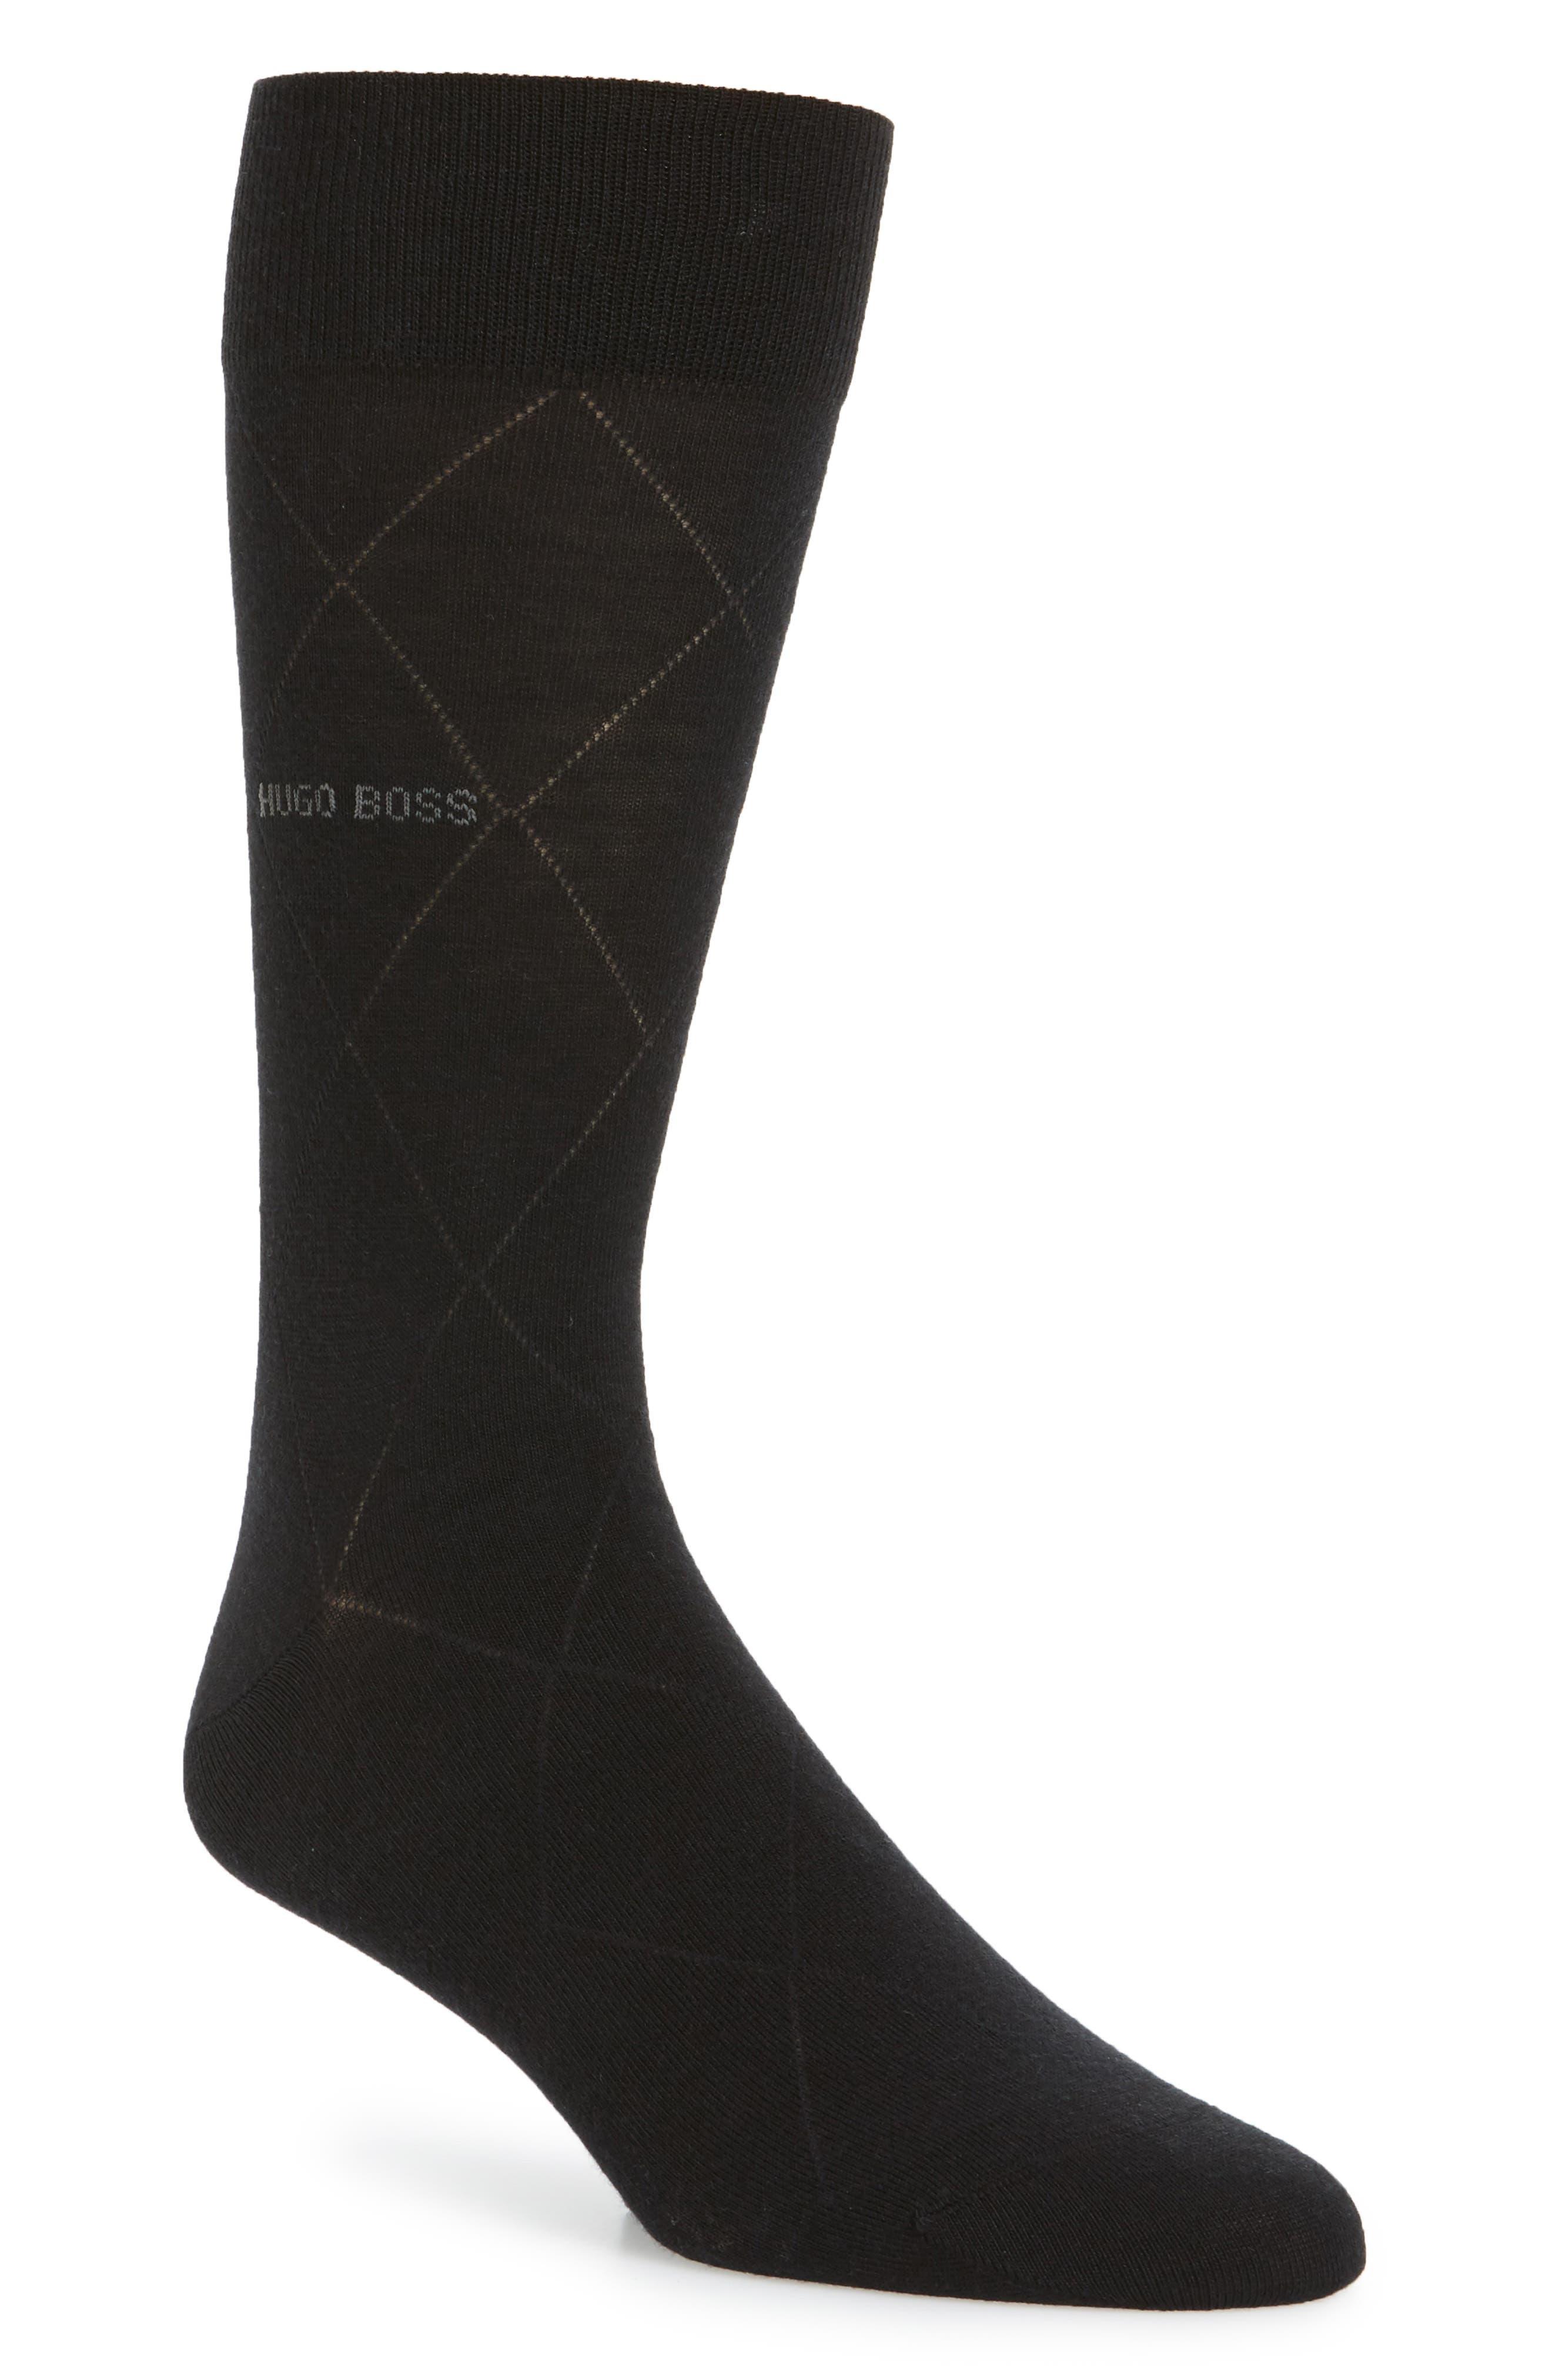 Argyle Crew Socks,                         Main,                         color, 001